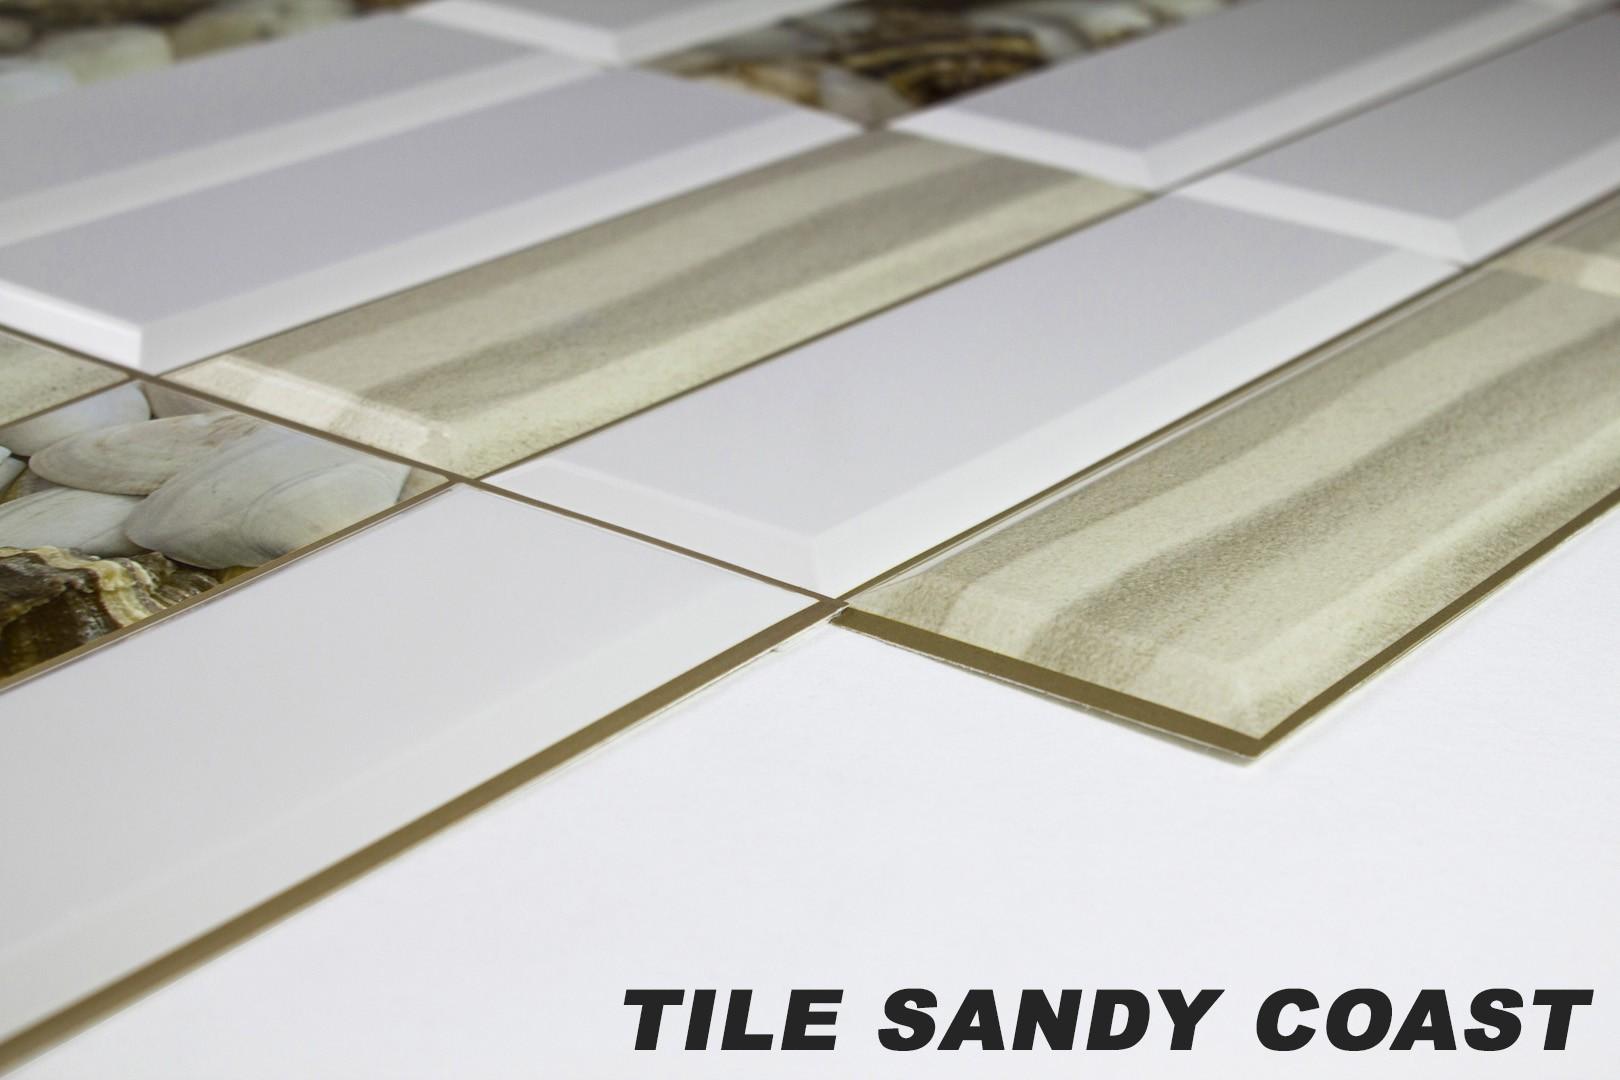 Tile sandy coast originalbild 1